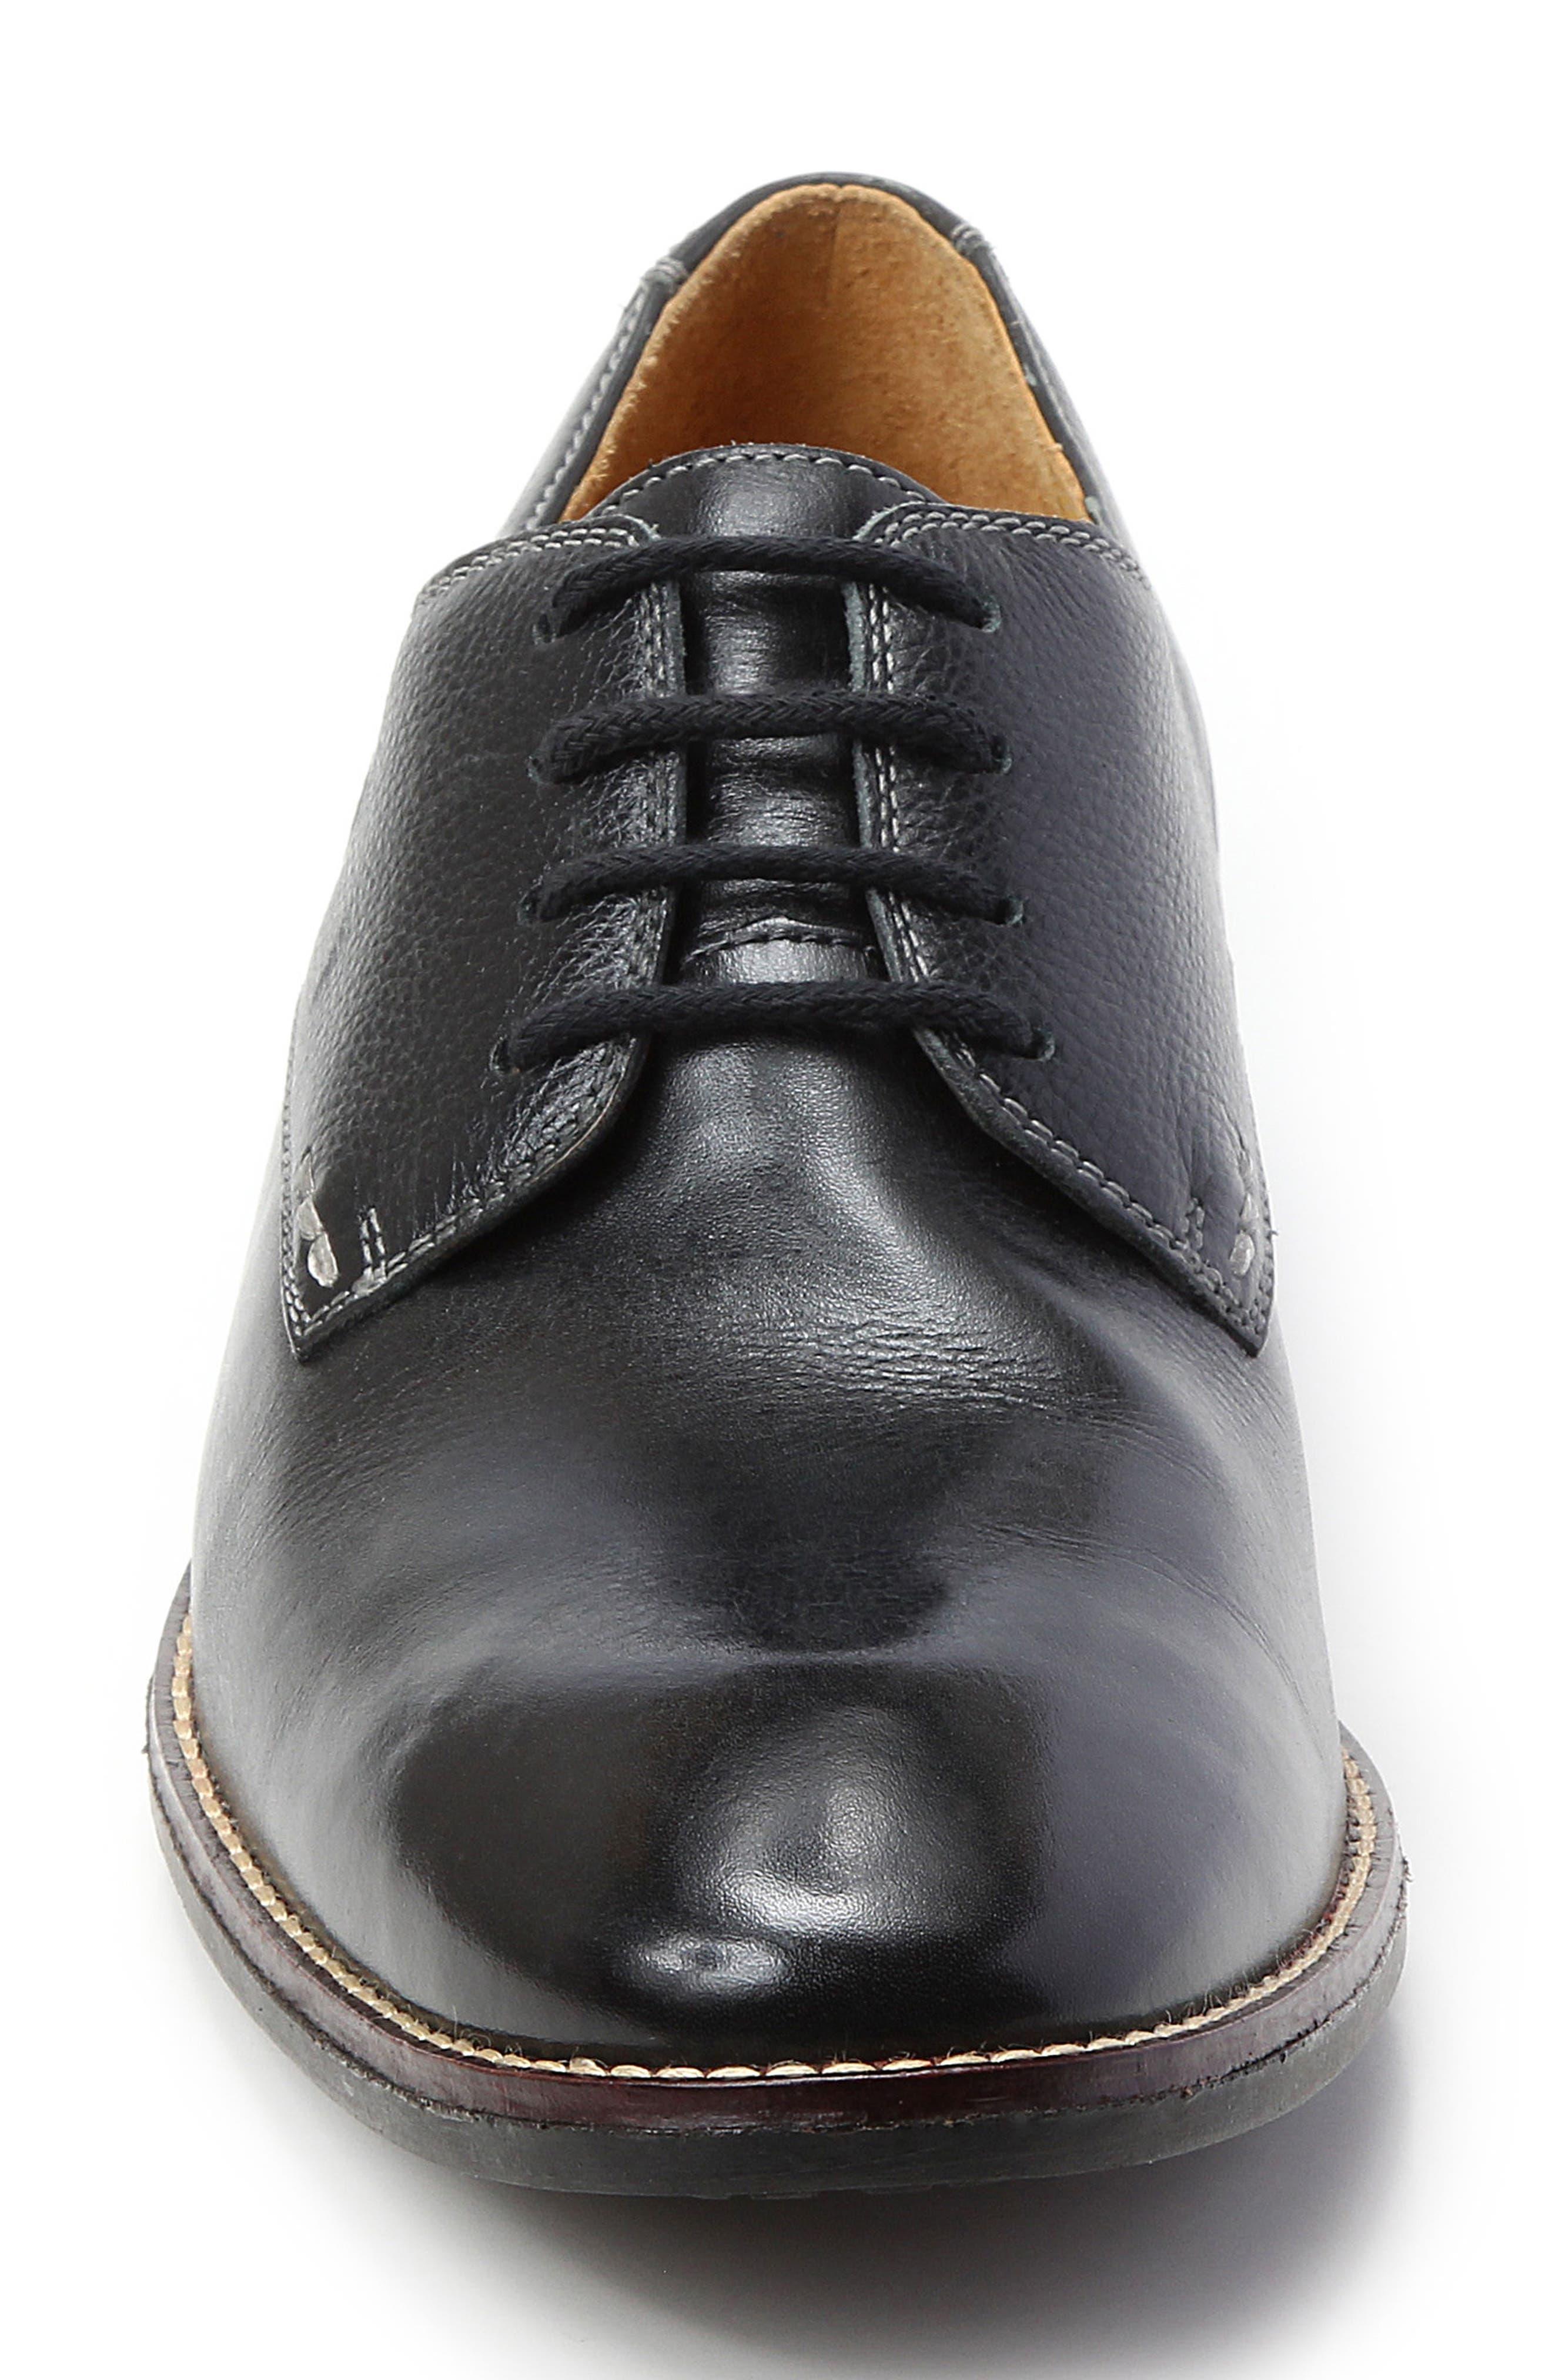 'Olsen' Plain Toe Derby,                             Alternate thumbnail 4, color,                             BLACK LEATHER